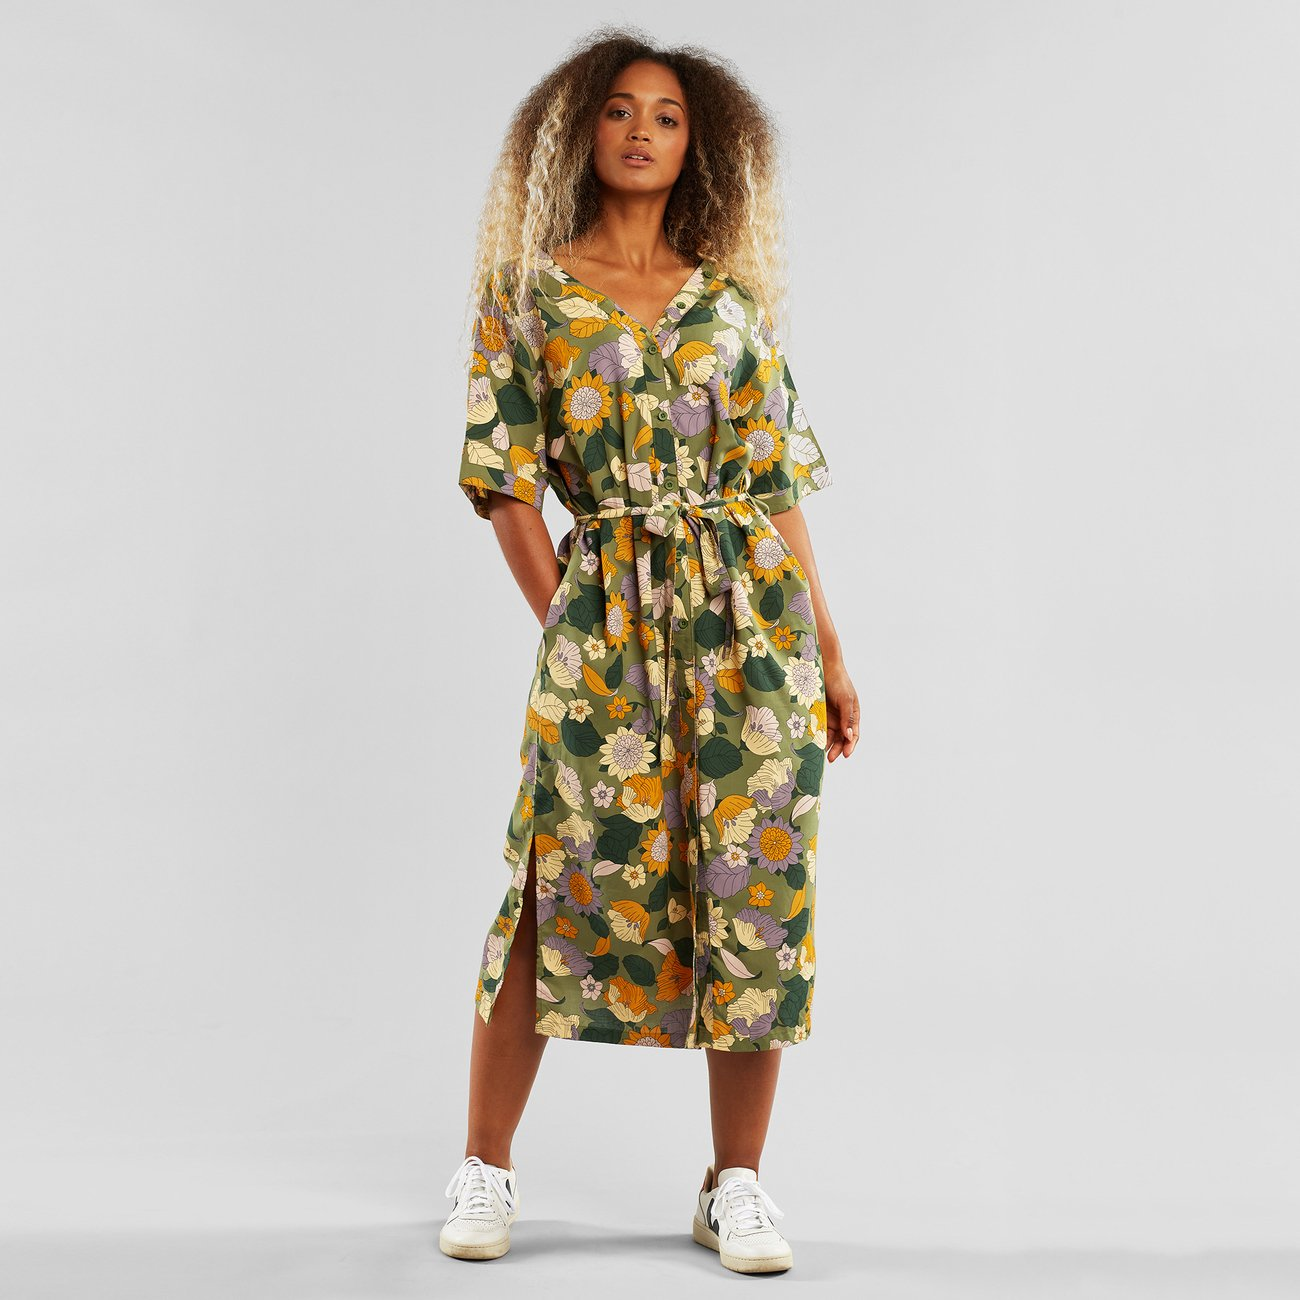 Dedicated - Dress Bornholm Seventies Floral Green